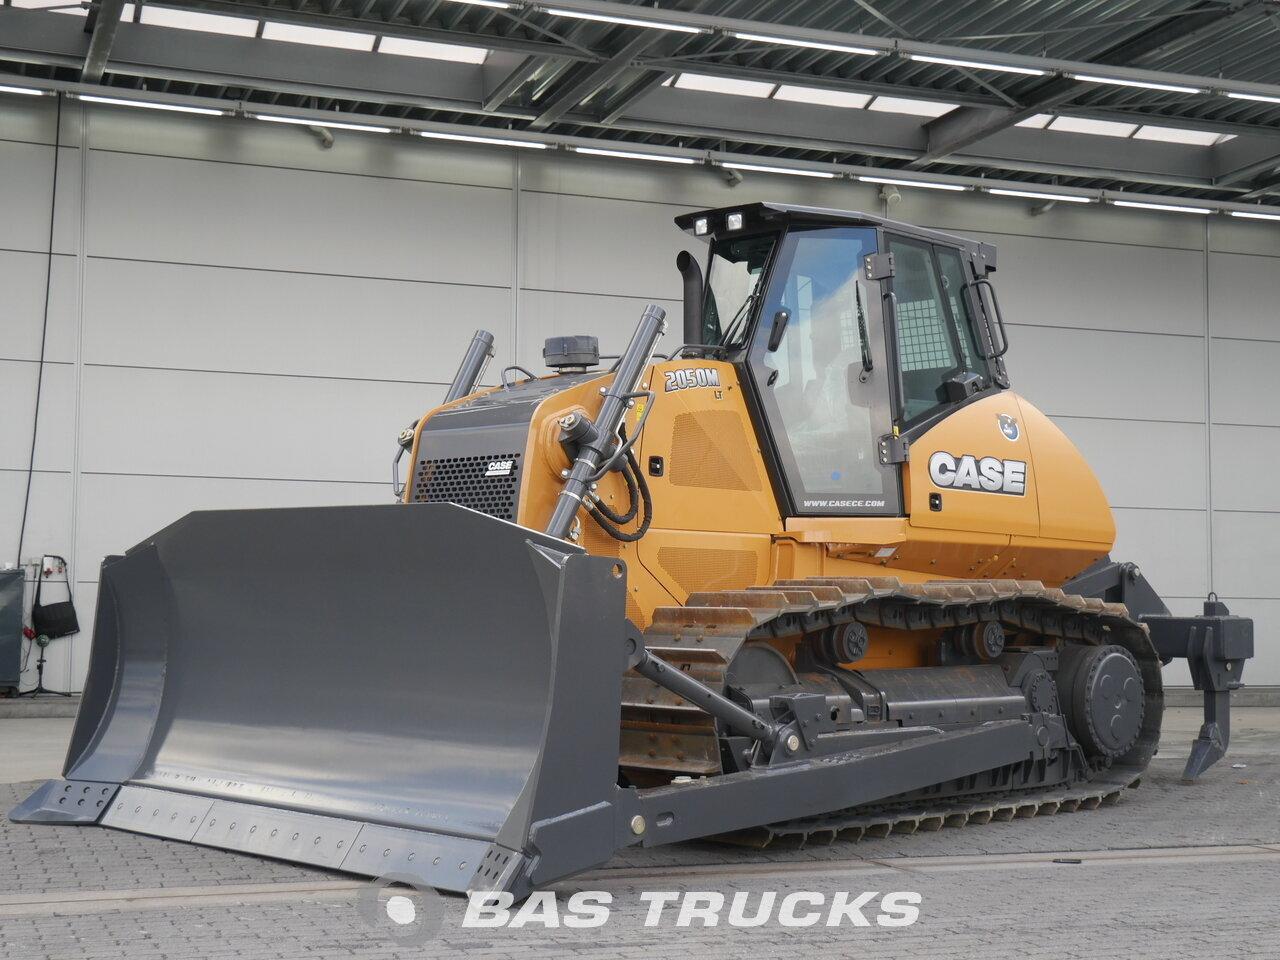 For sale at BAS Trucks: Case 2050M LT Track 01/2015